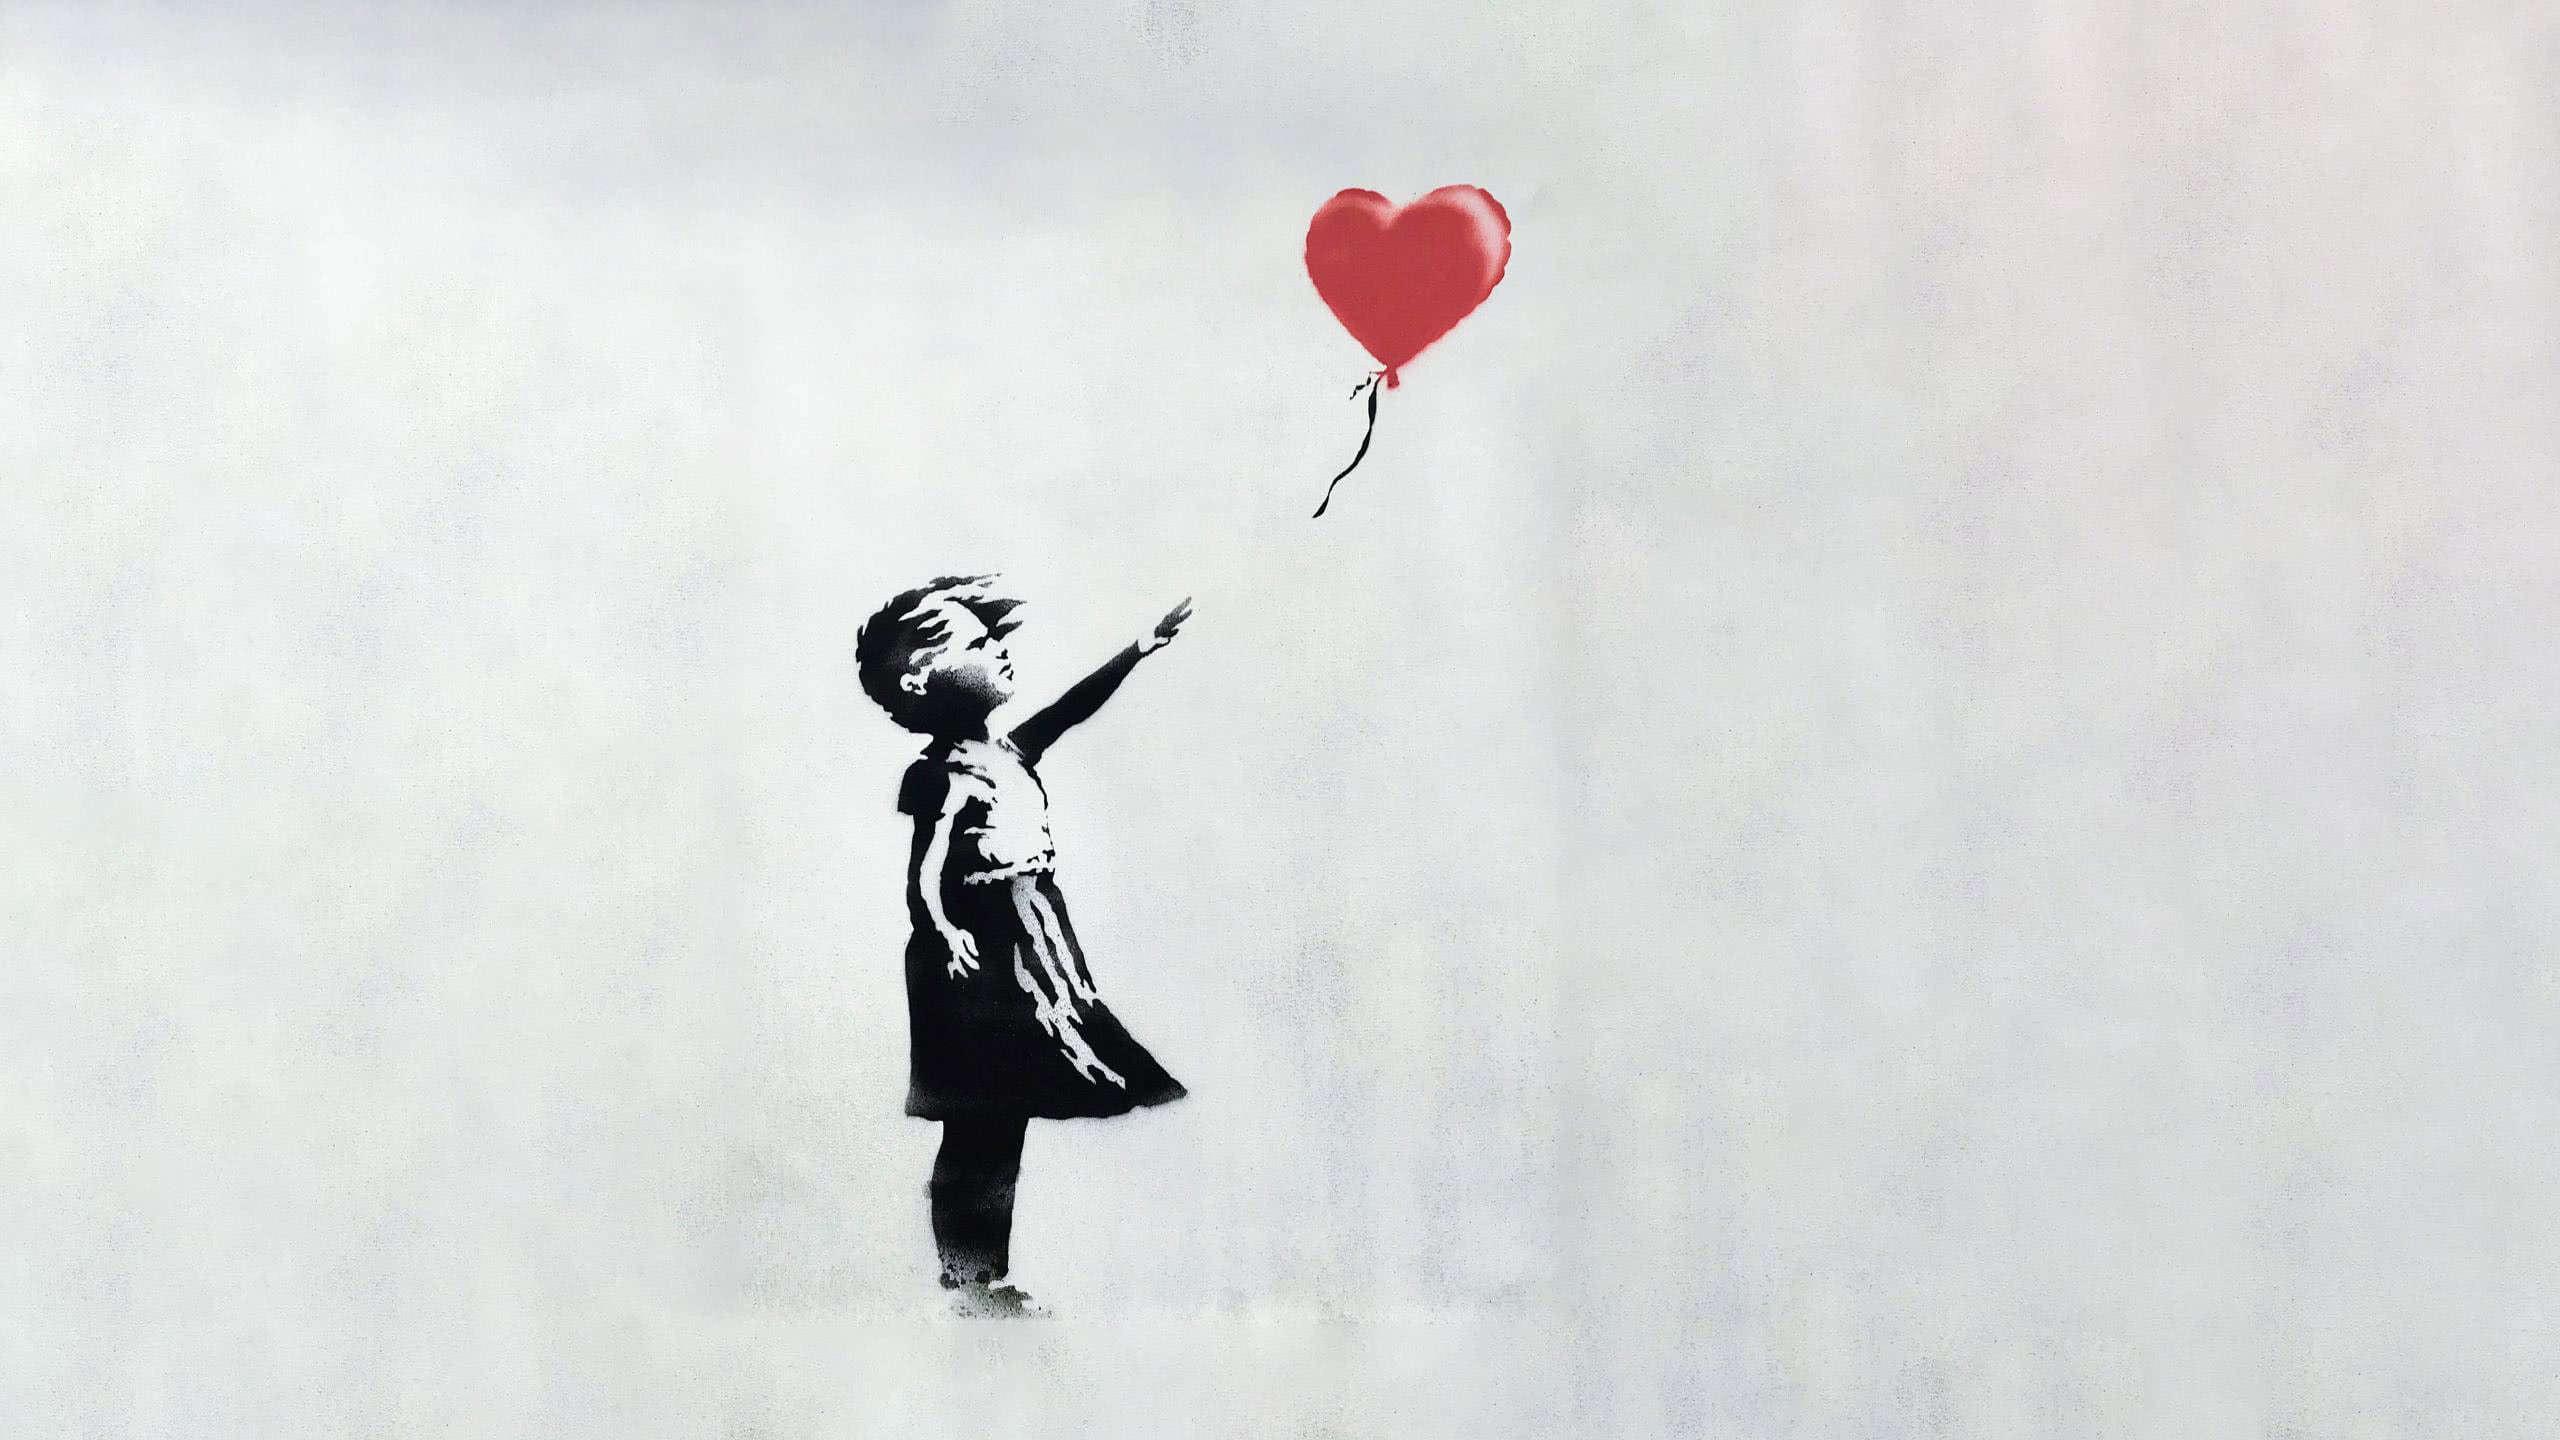 banksy baloon girl painting wqhd 1440p wallpaper